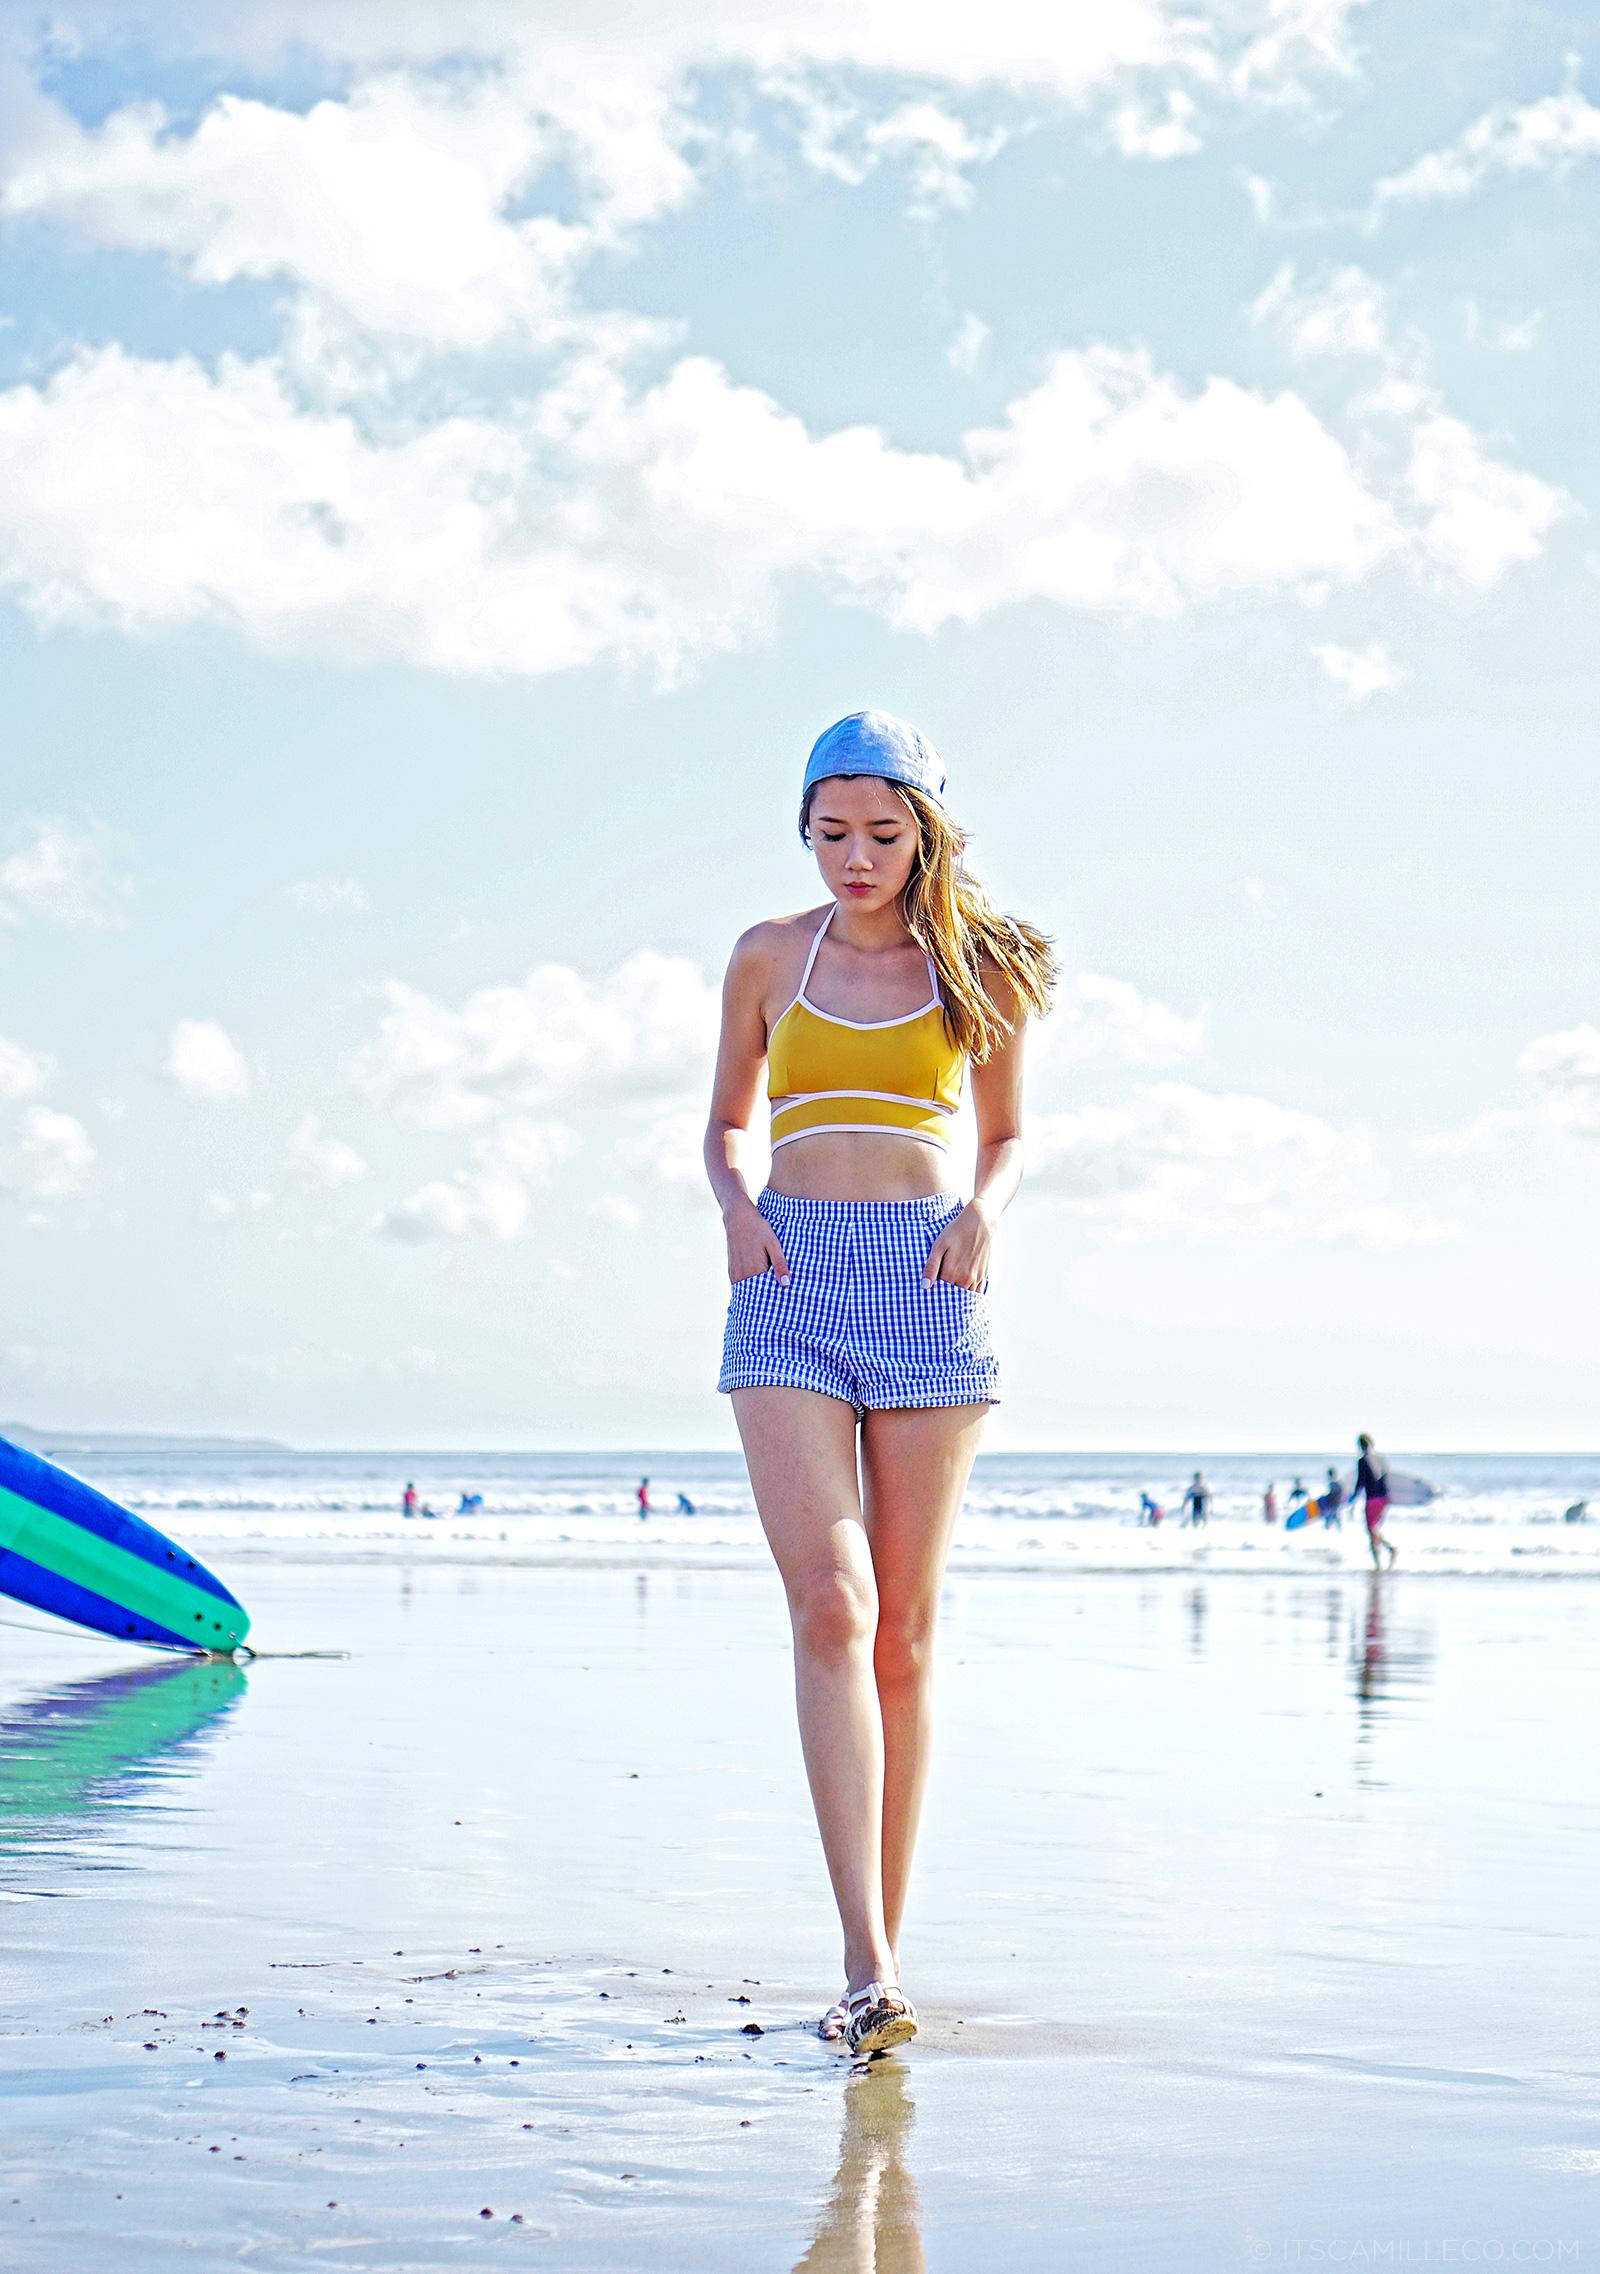 Cesa Bikini, Topshop, H&M At Kuta Beach, Bali | www.itscamilleco.com